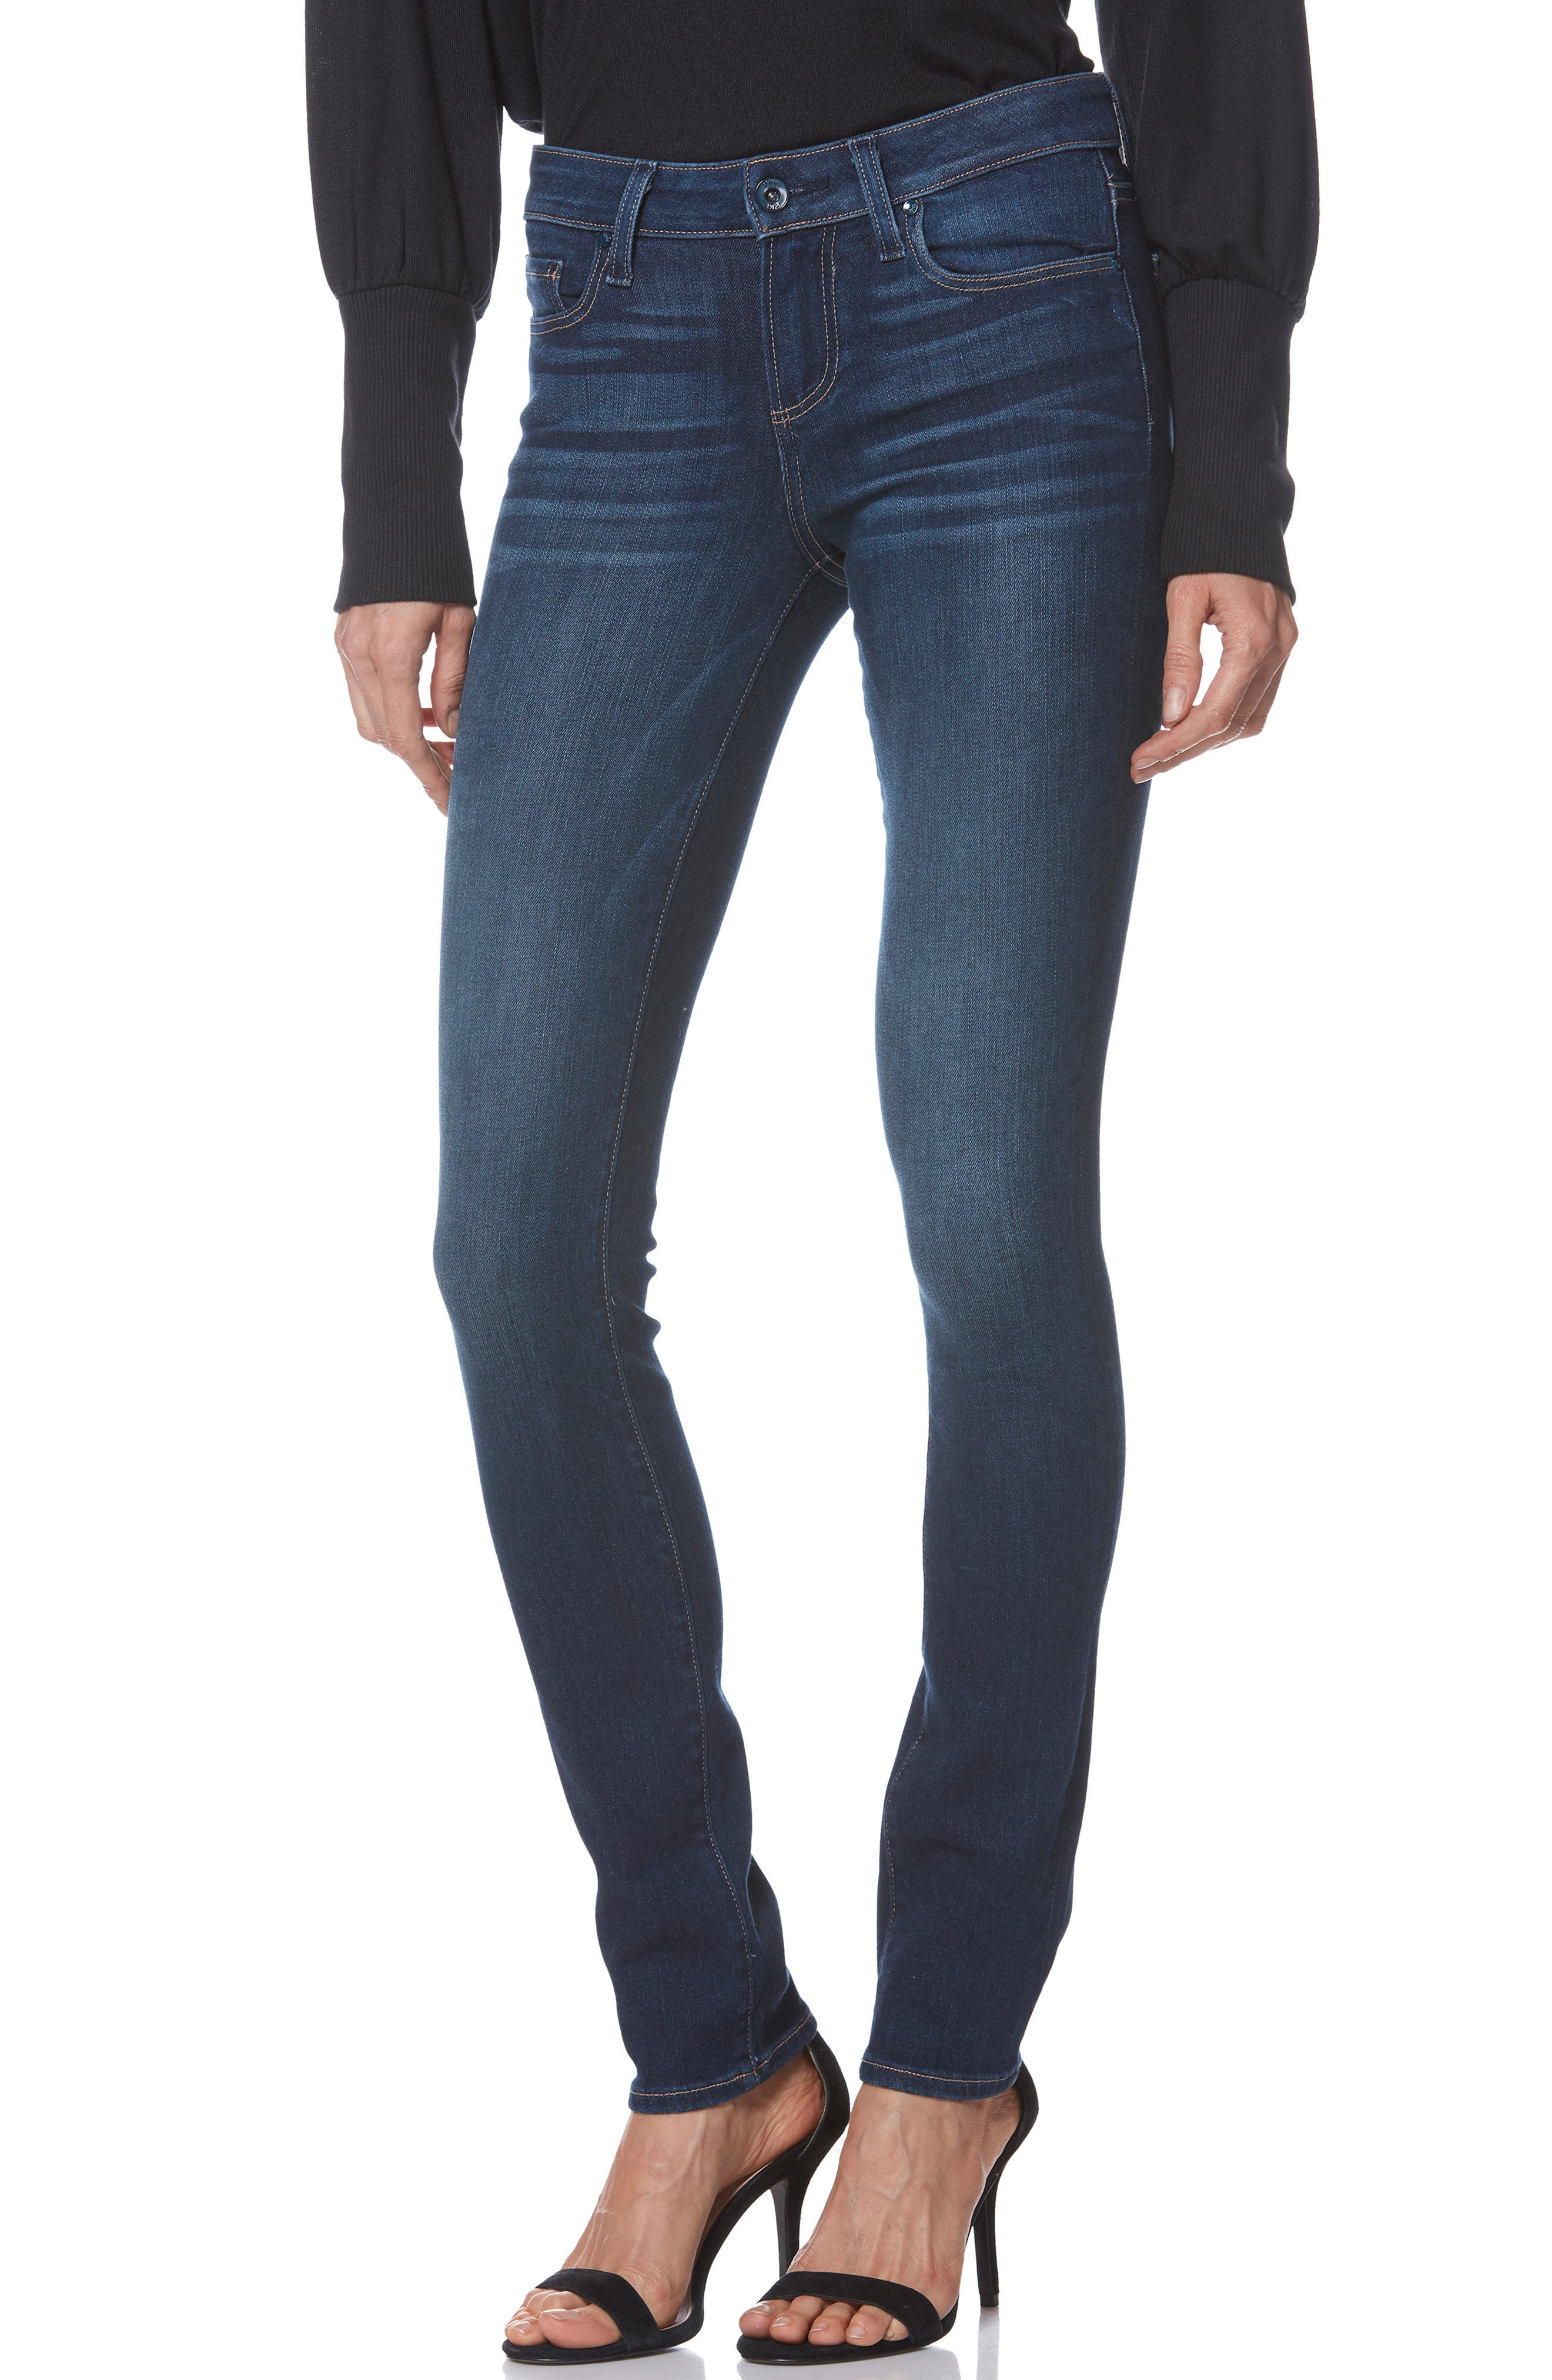 Skyline Skinny Jeans,                             Main thumbnail 1, color,                             IDLEWILD